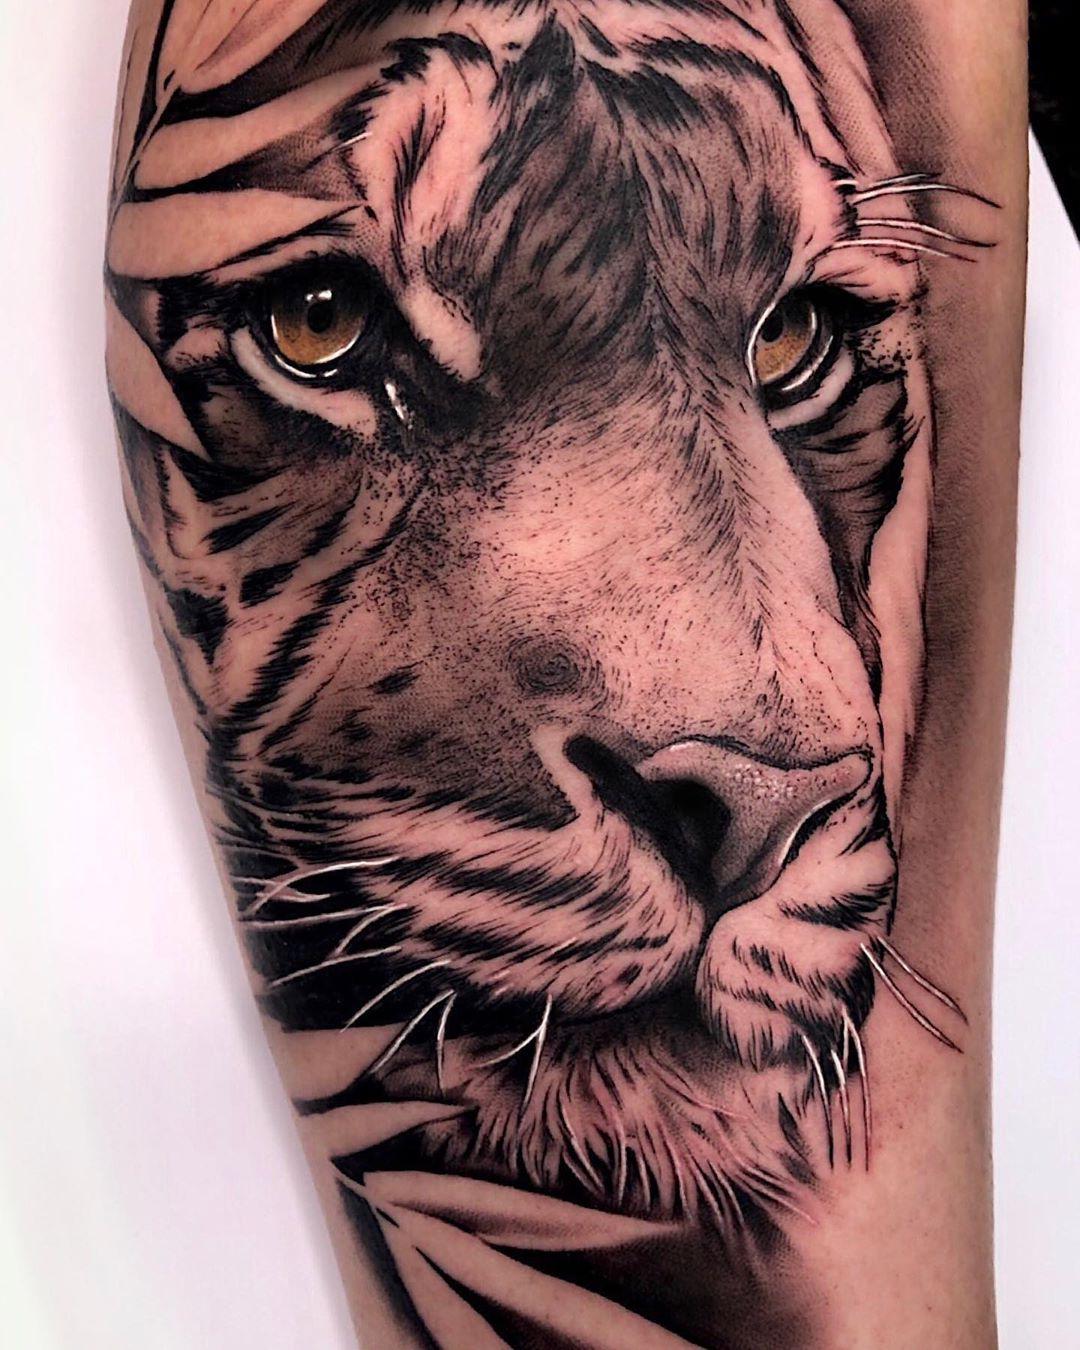 ink,inked,inkedgirl,ciudadreal,puertollano,castillalamancha,tattoo,tatuaje,bestink,inkedboy,realismotattoo,daimiel,ciudadrealtatuaje,tatuajesenciudadreal